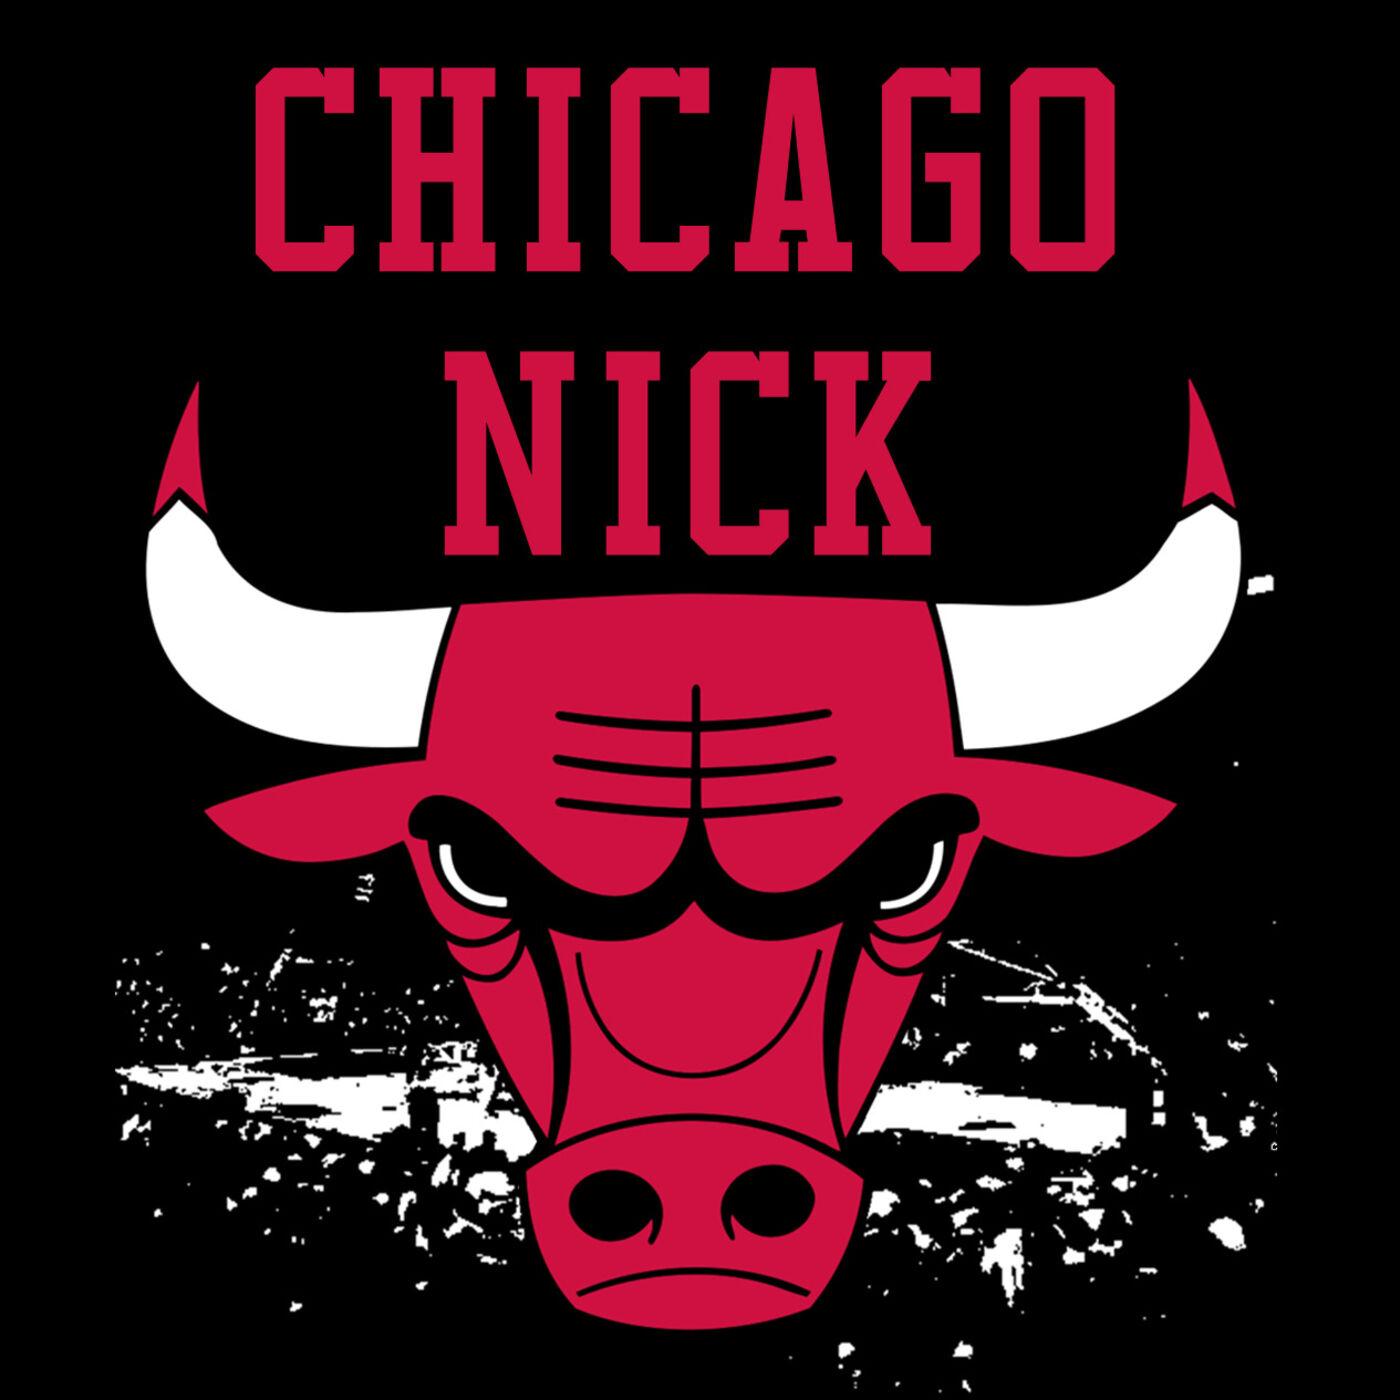 Shake n' Bake: S05E24 - Chicago Nick